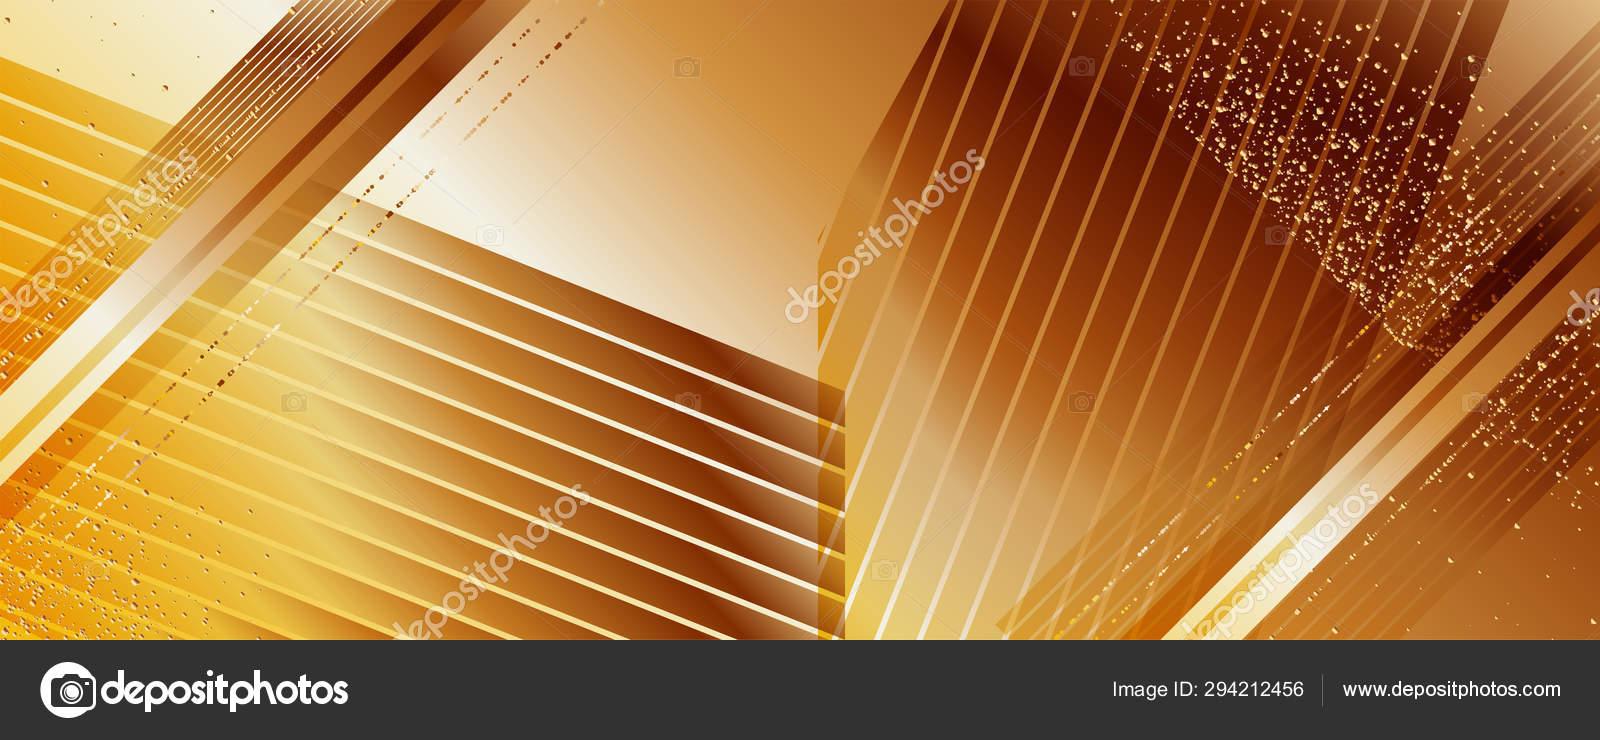 template autumn gold background orange yellow gold stock vector c kartavaya o mail ru 294212456 https depositphotos com 294212456 stock illustration template autumn gold background orange html